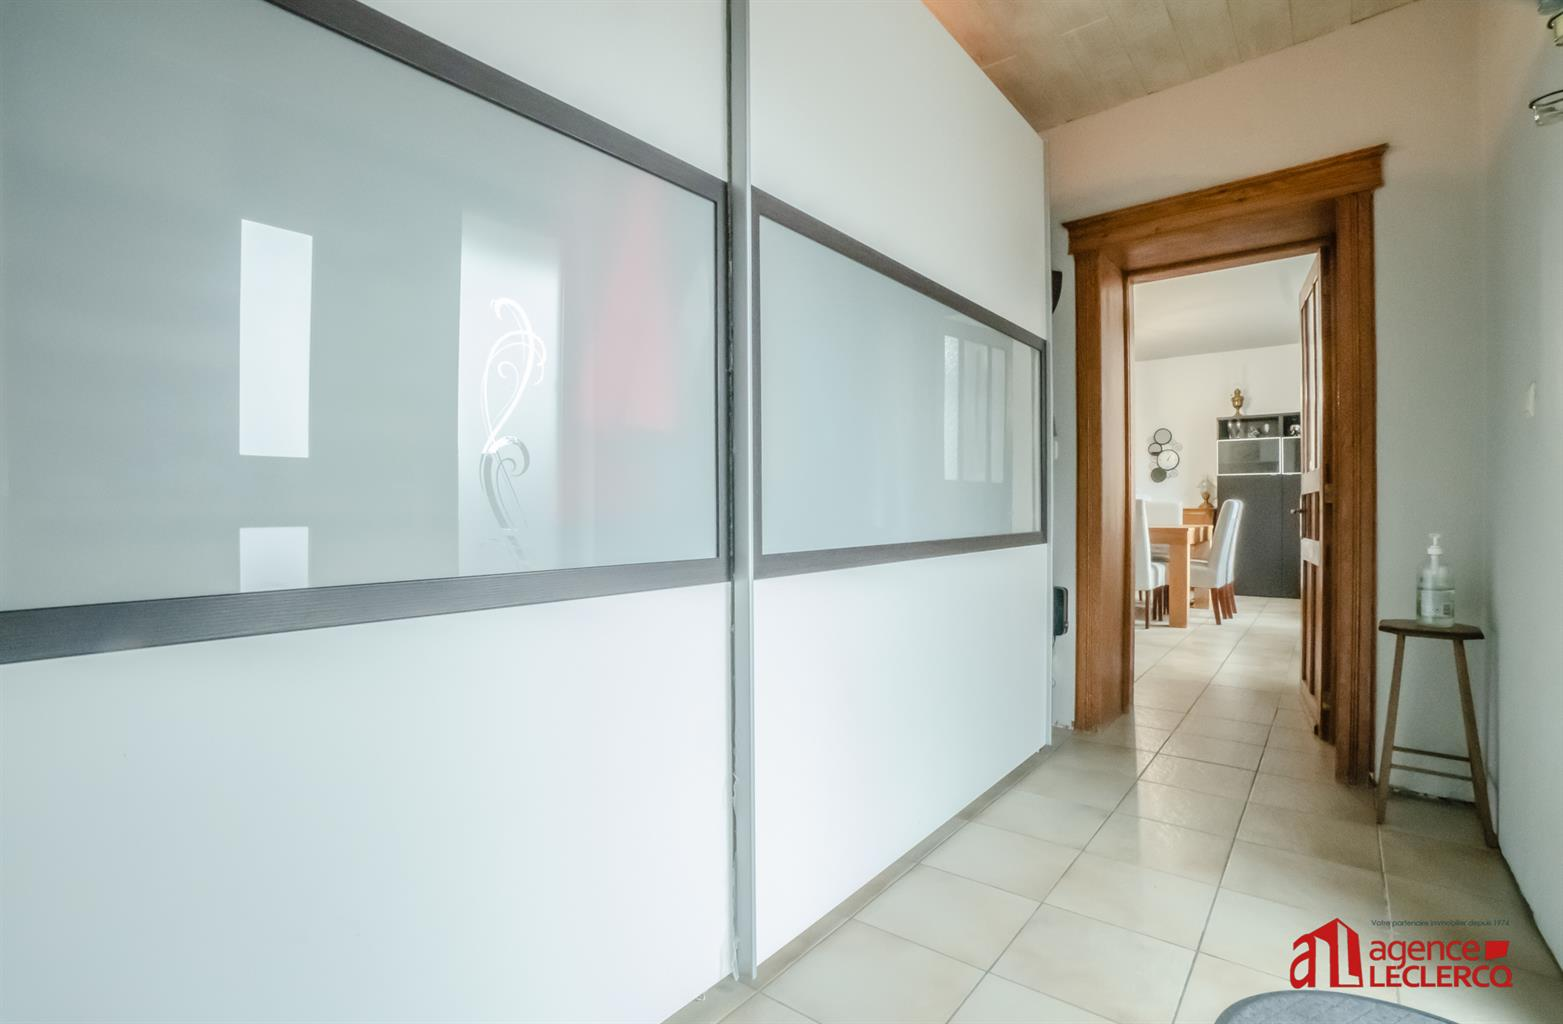 Maison - Gaurain-Ramecroix - #4408184-5